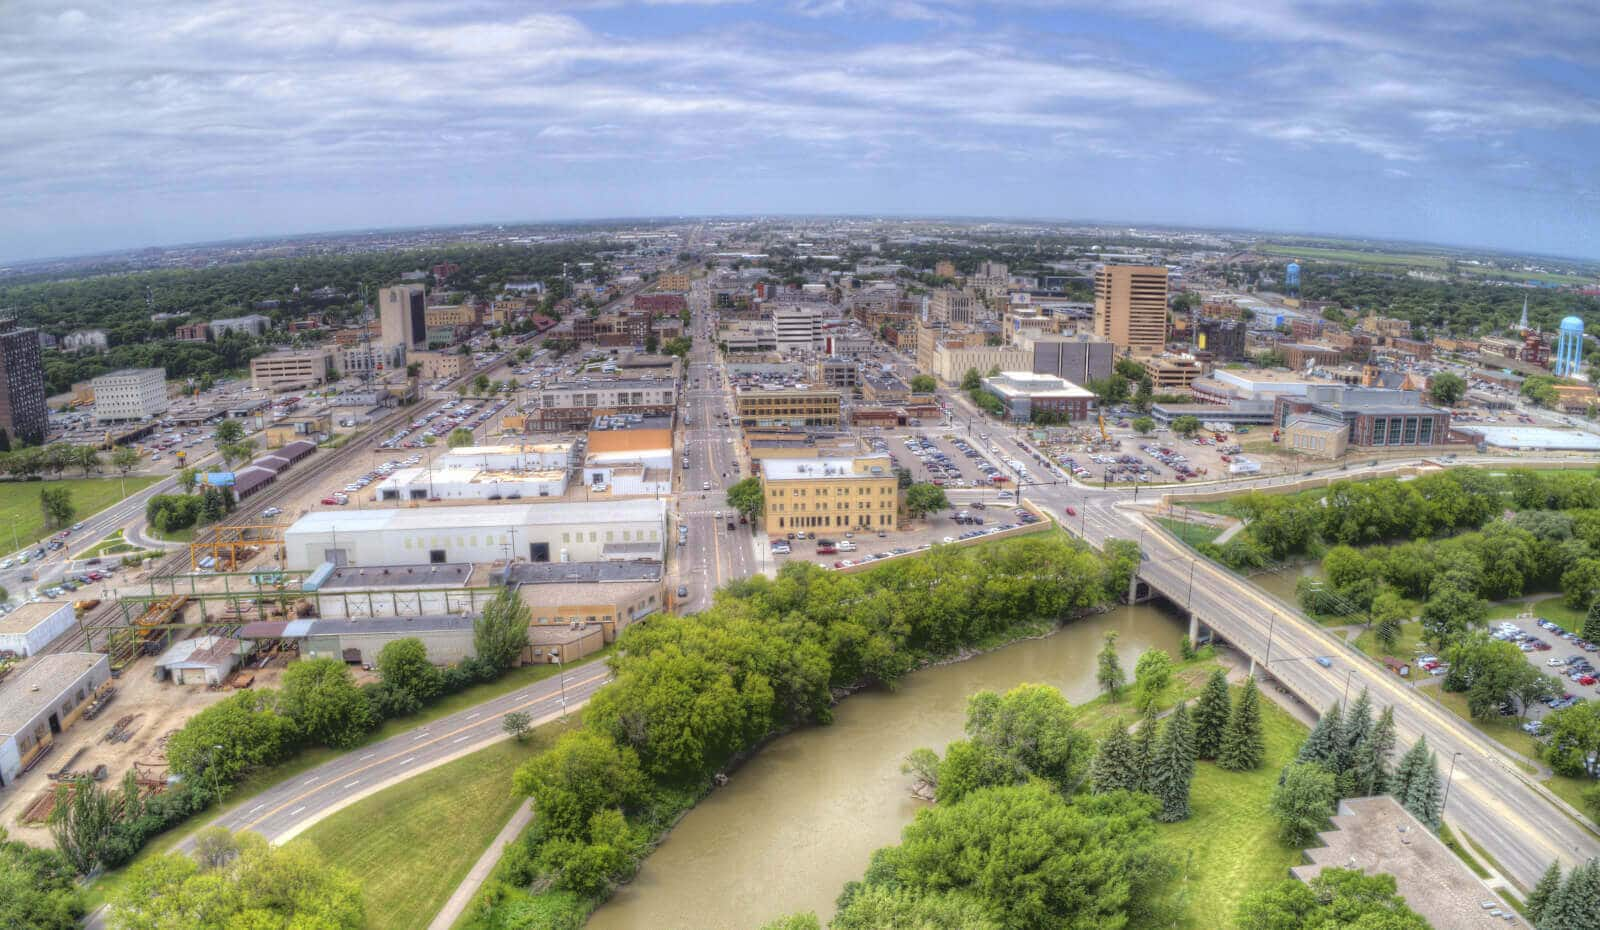 Teen Driving App >> Fargo, North Dakota Alcohol and Drug Rehab - Addiction Center